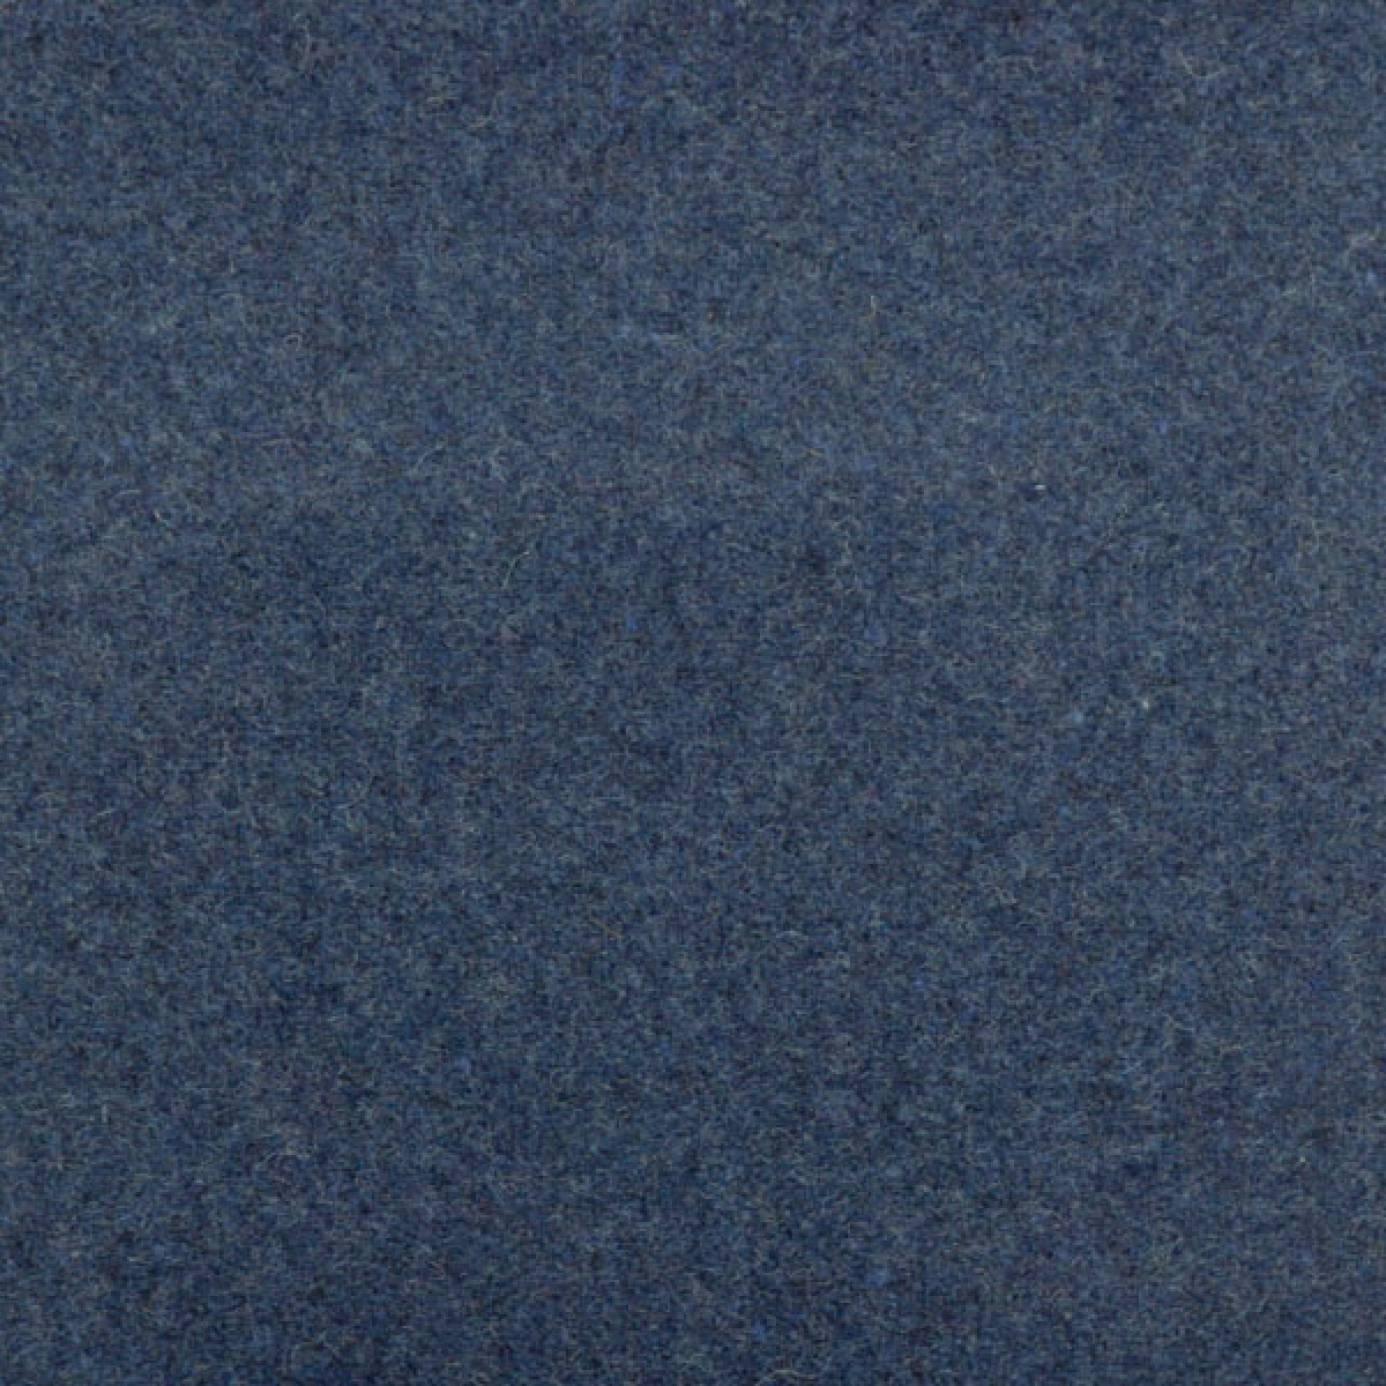 Amatheon fabric denim amatheondenim warwick legends for Denim fabric